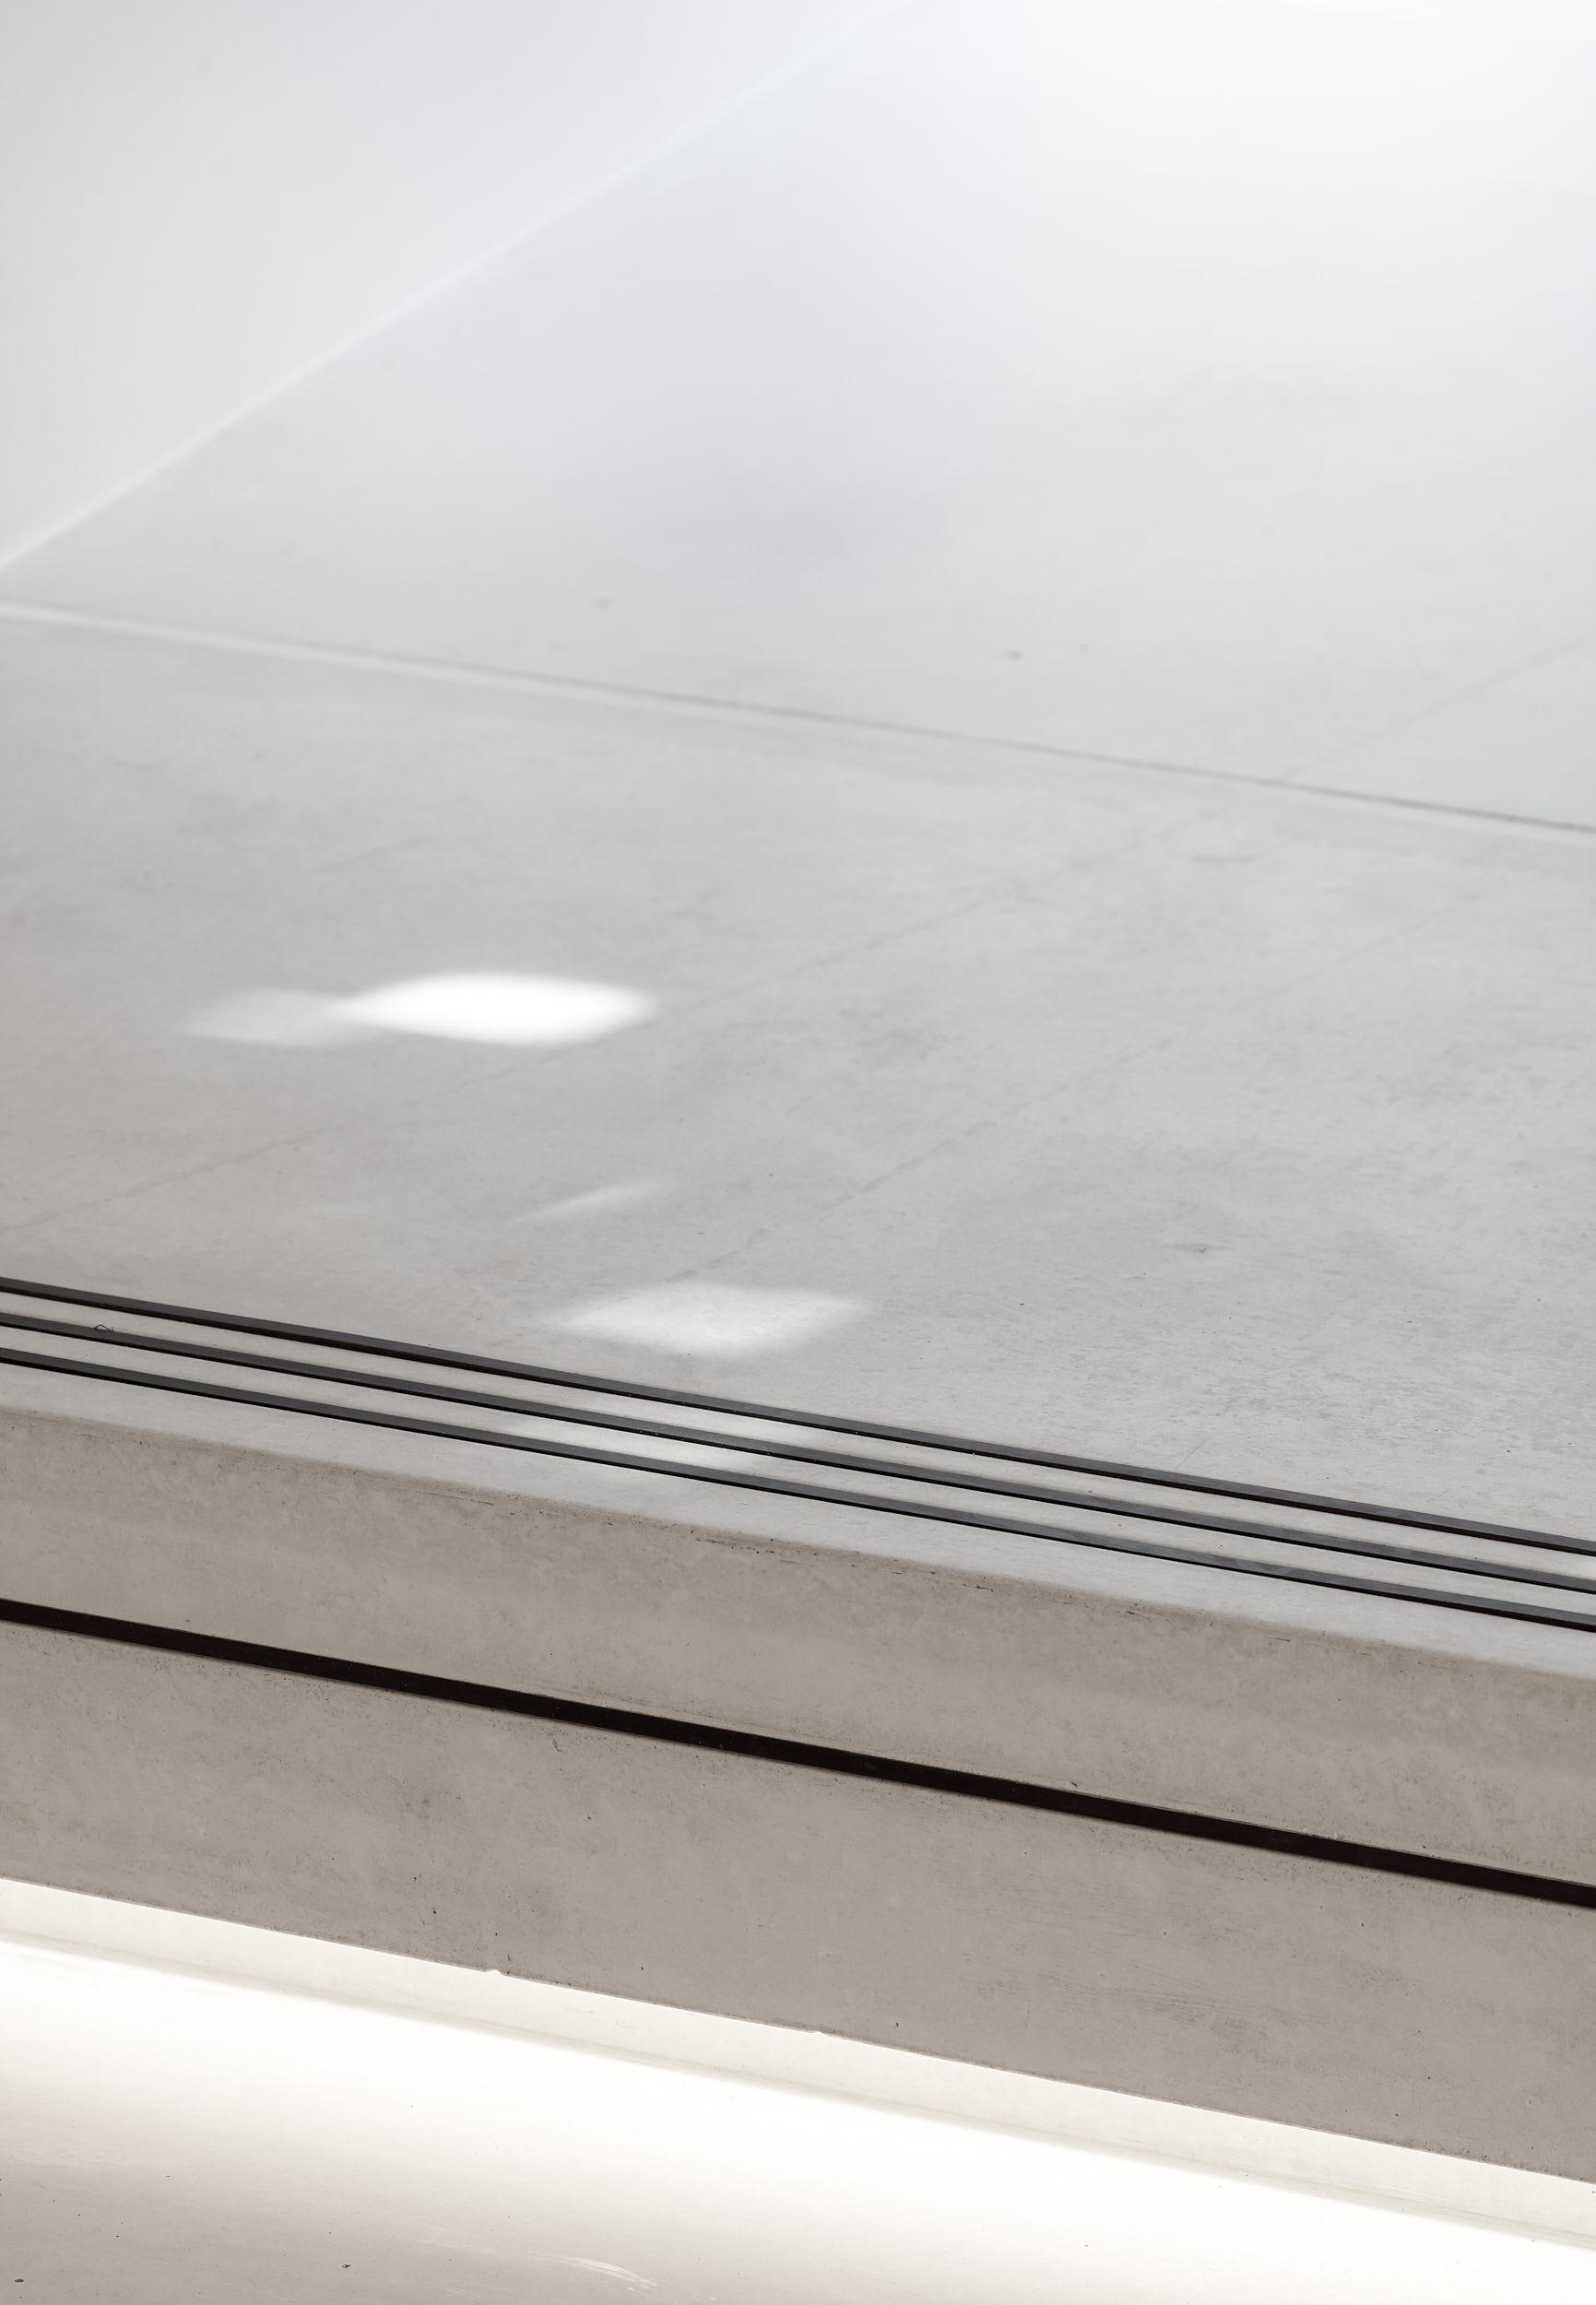 Interior photograph showing the precast concrete nosing detail.